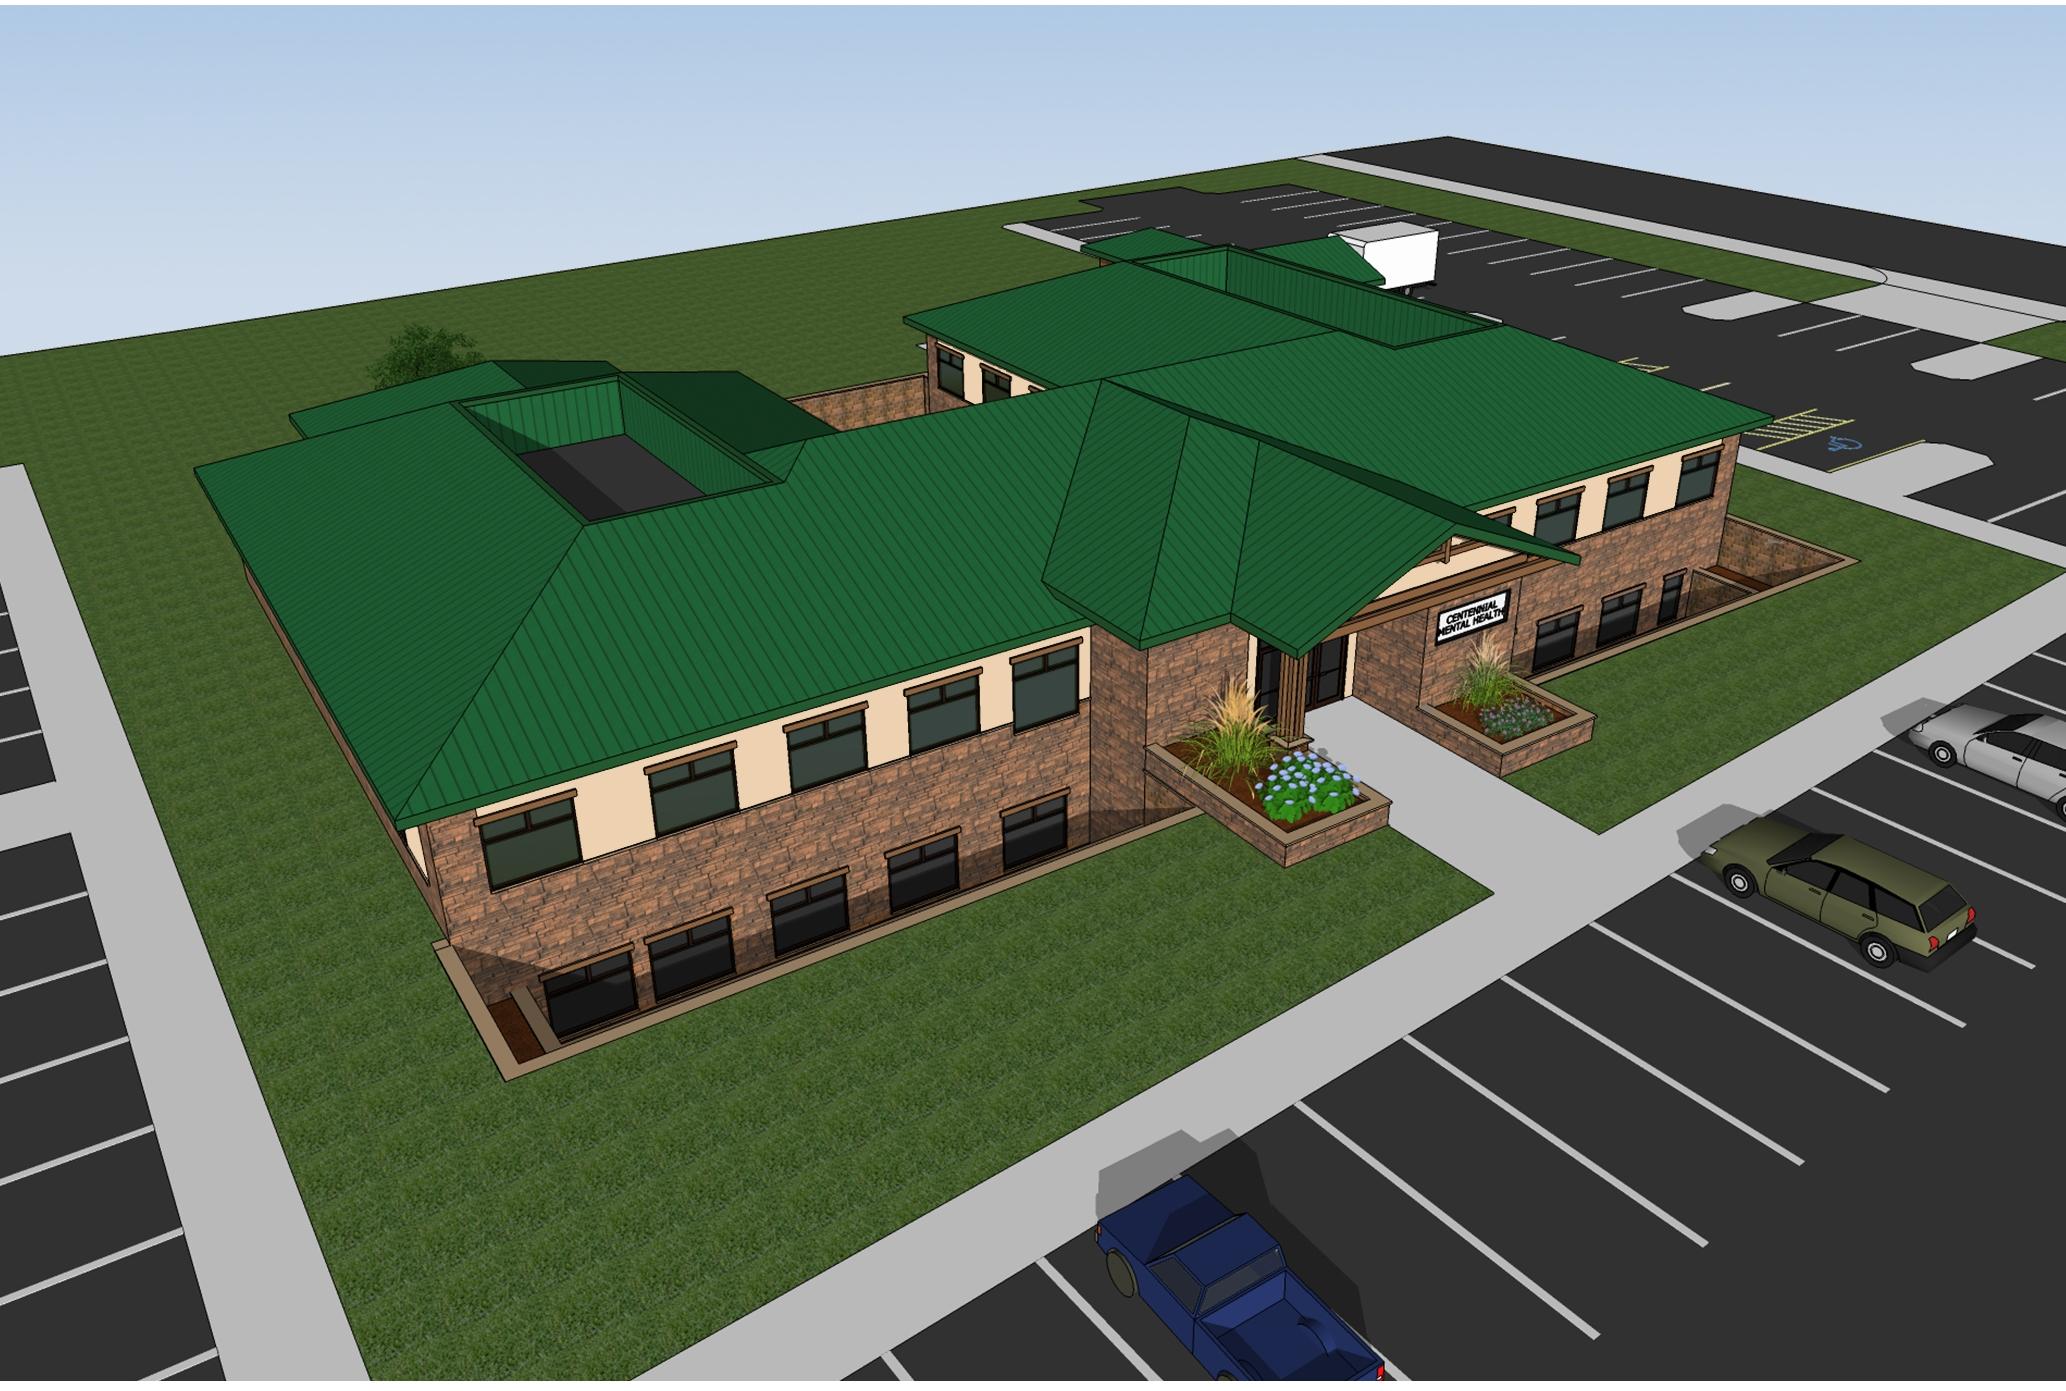 Centennial Mental Health Integrated Care Center Fort Morgan, CO